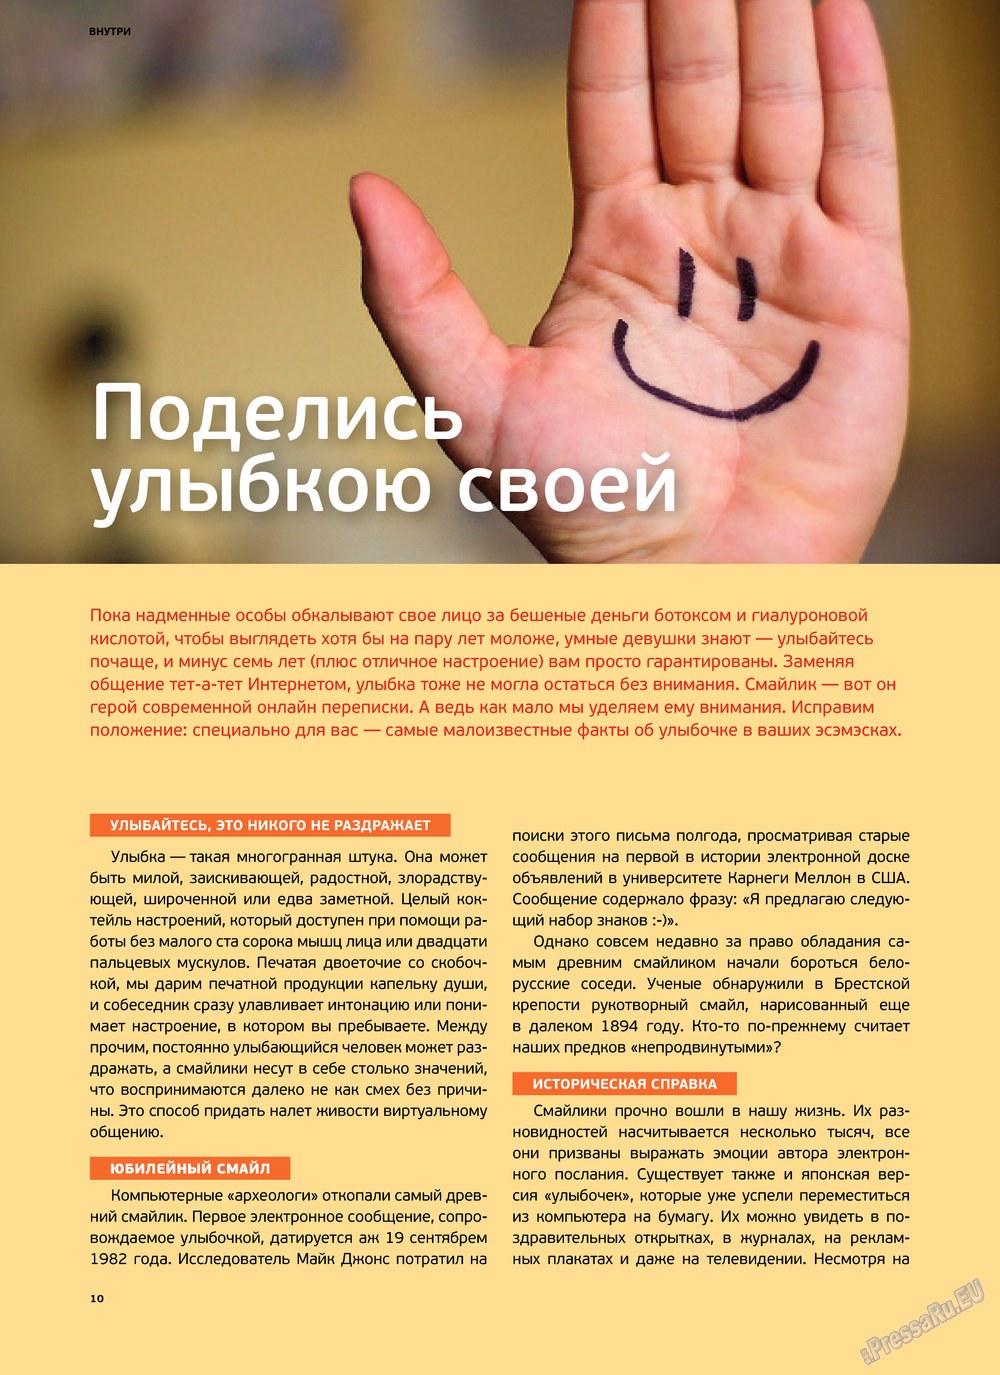 Артек (журнал). 2013 год, номер 1, стр. 12